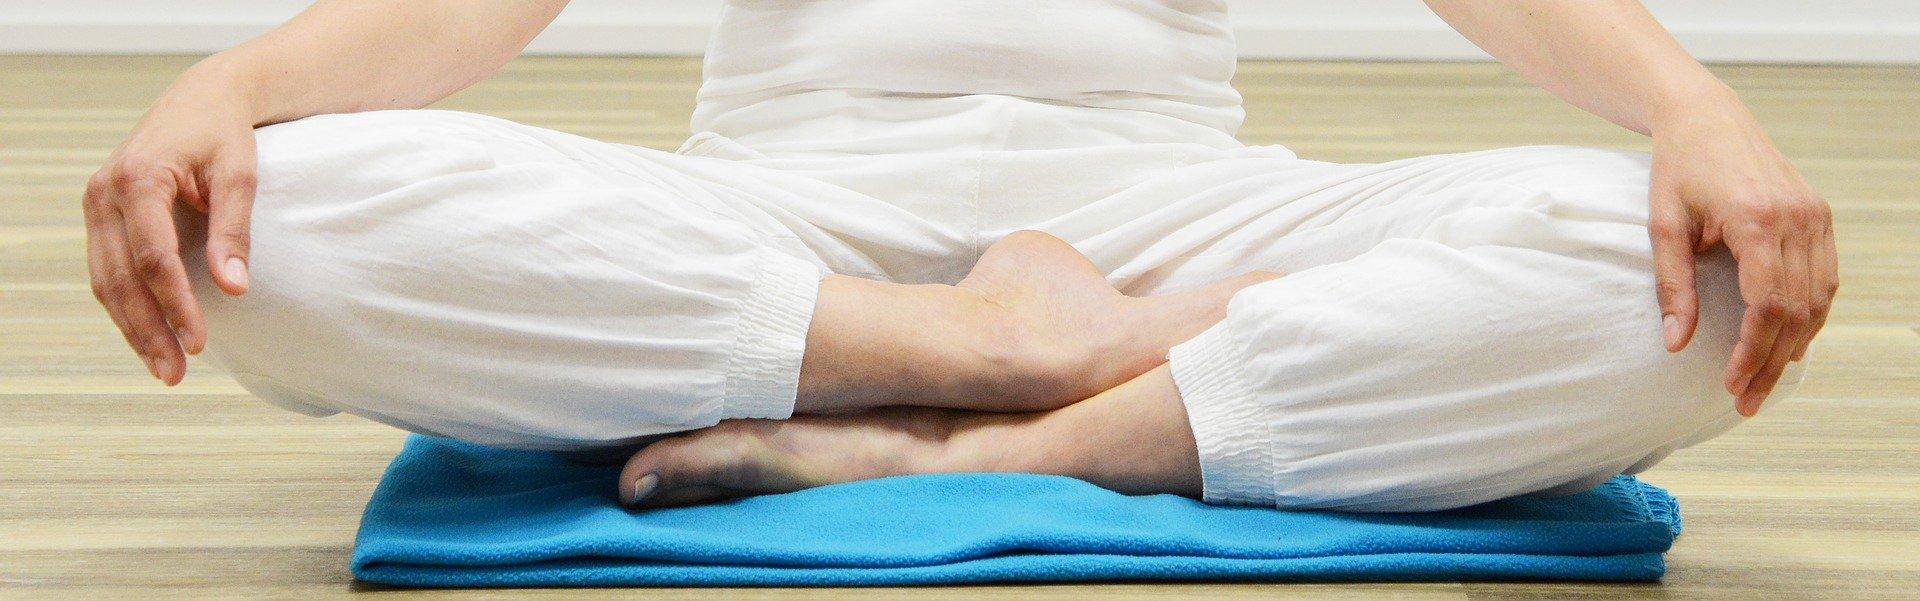 person sitting on blue mat doing meditation